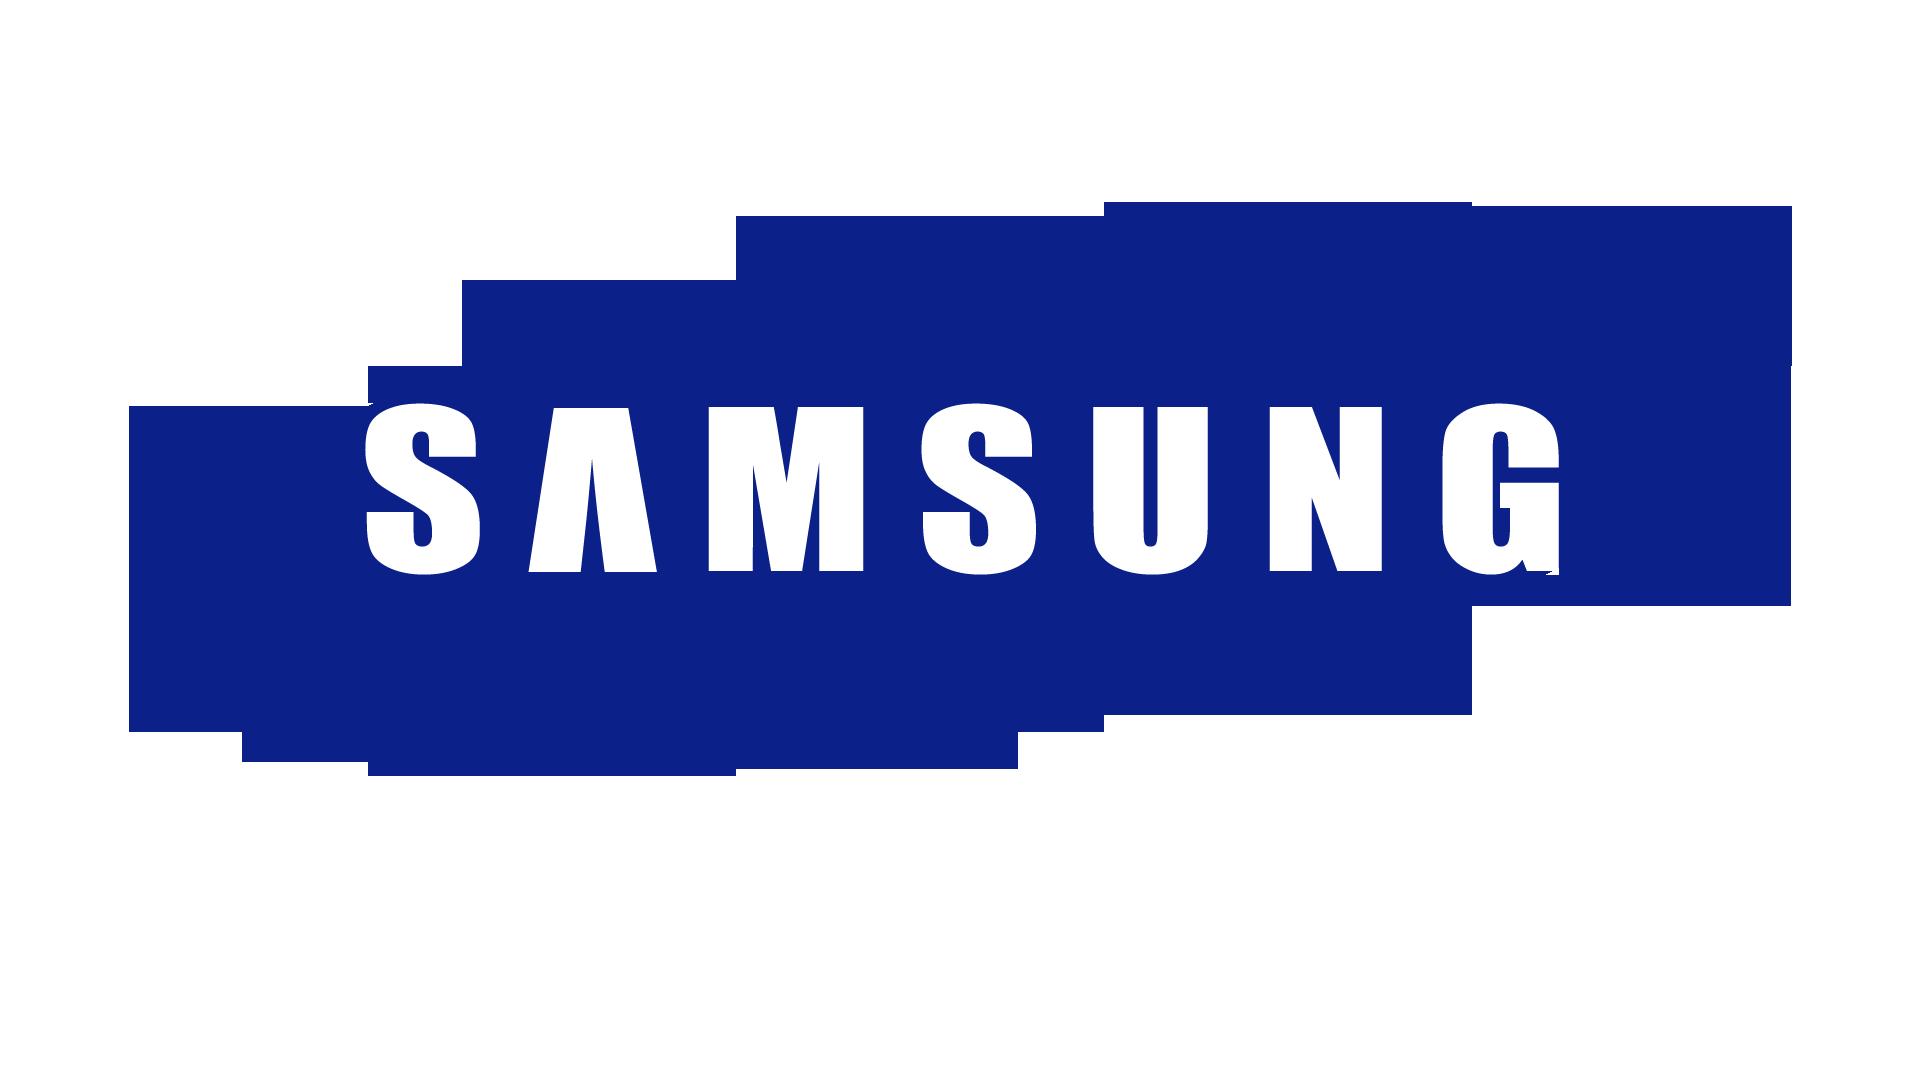 (Original Logo) Samsung by 18cjoj on DeviantArt